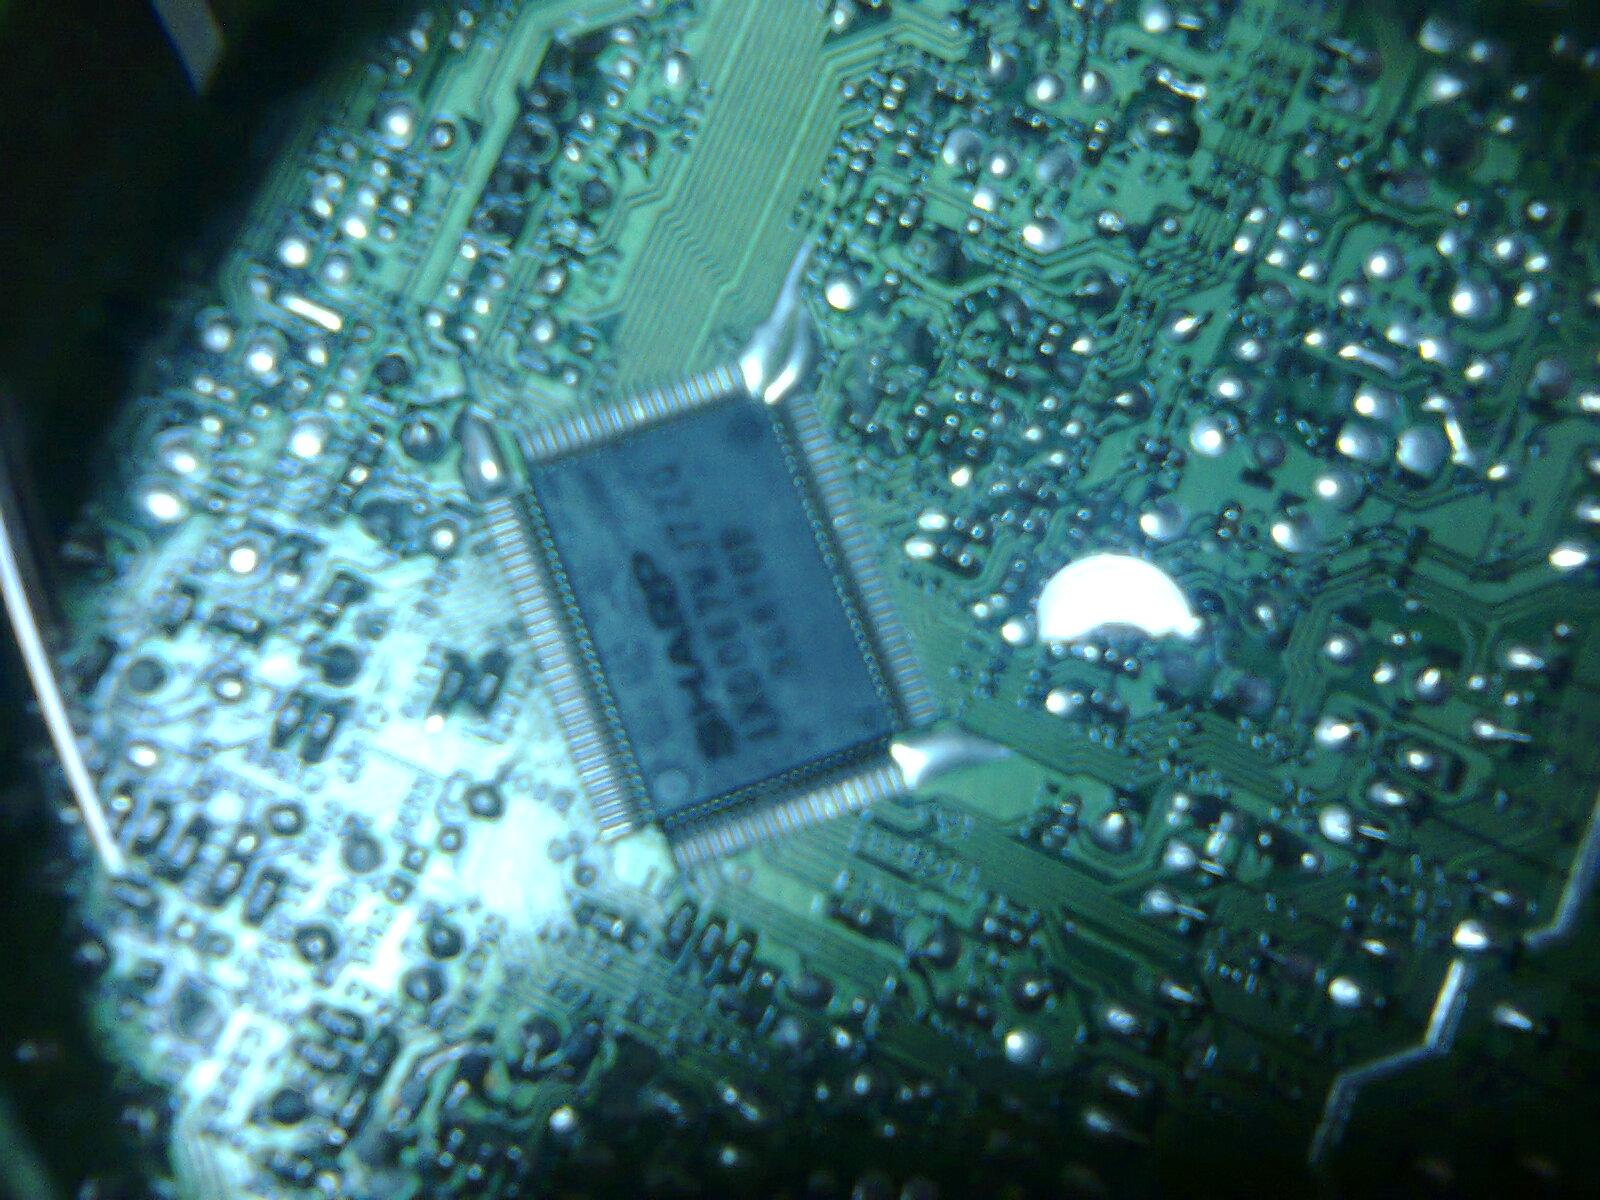 Solder Pecebeq  Data Pin Protec    sharp    picolo IXD067wjzzq